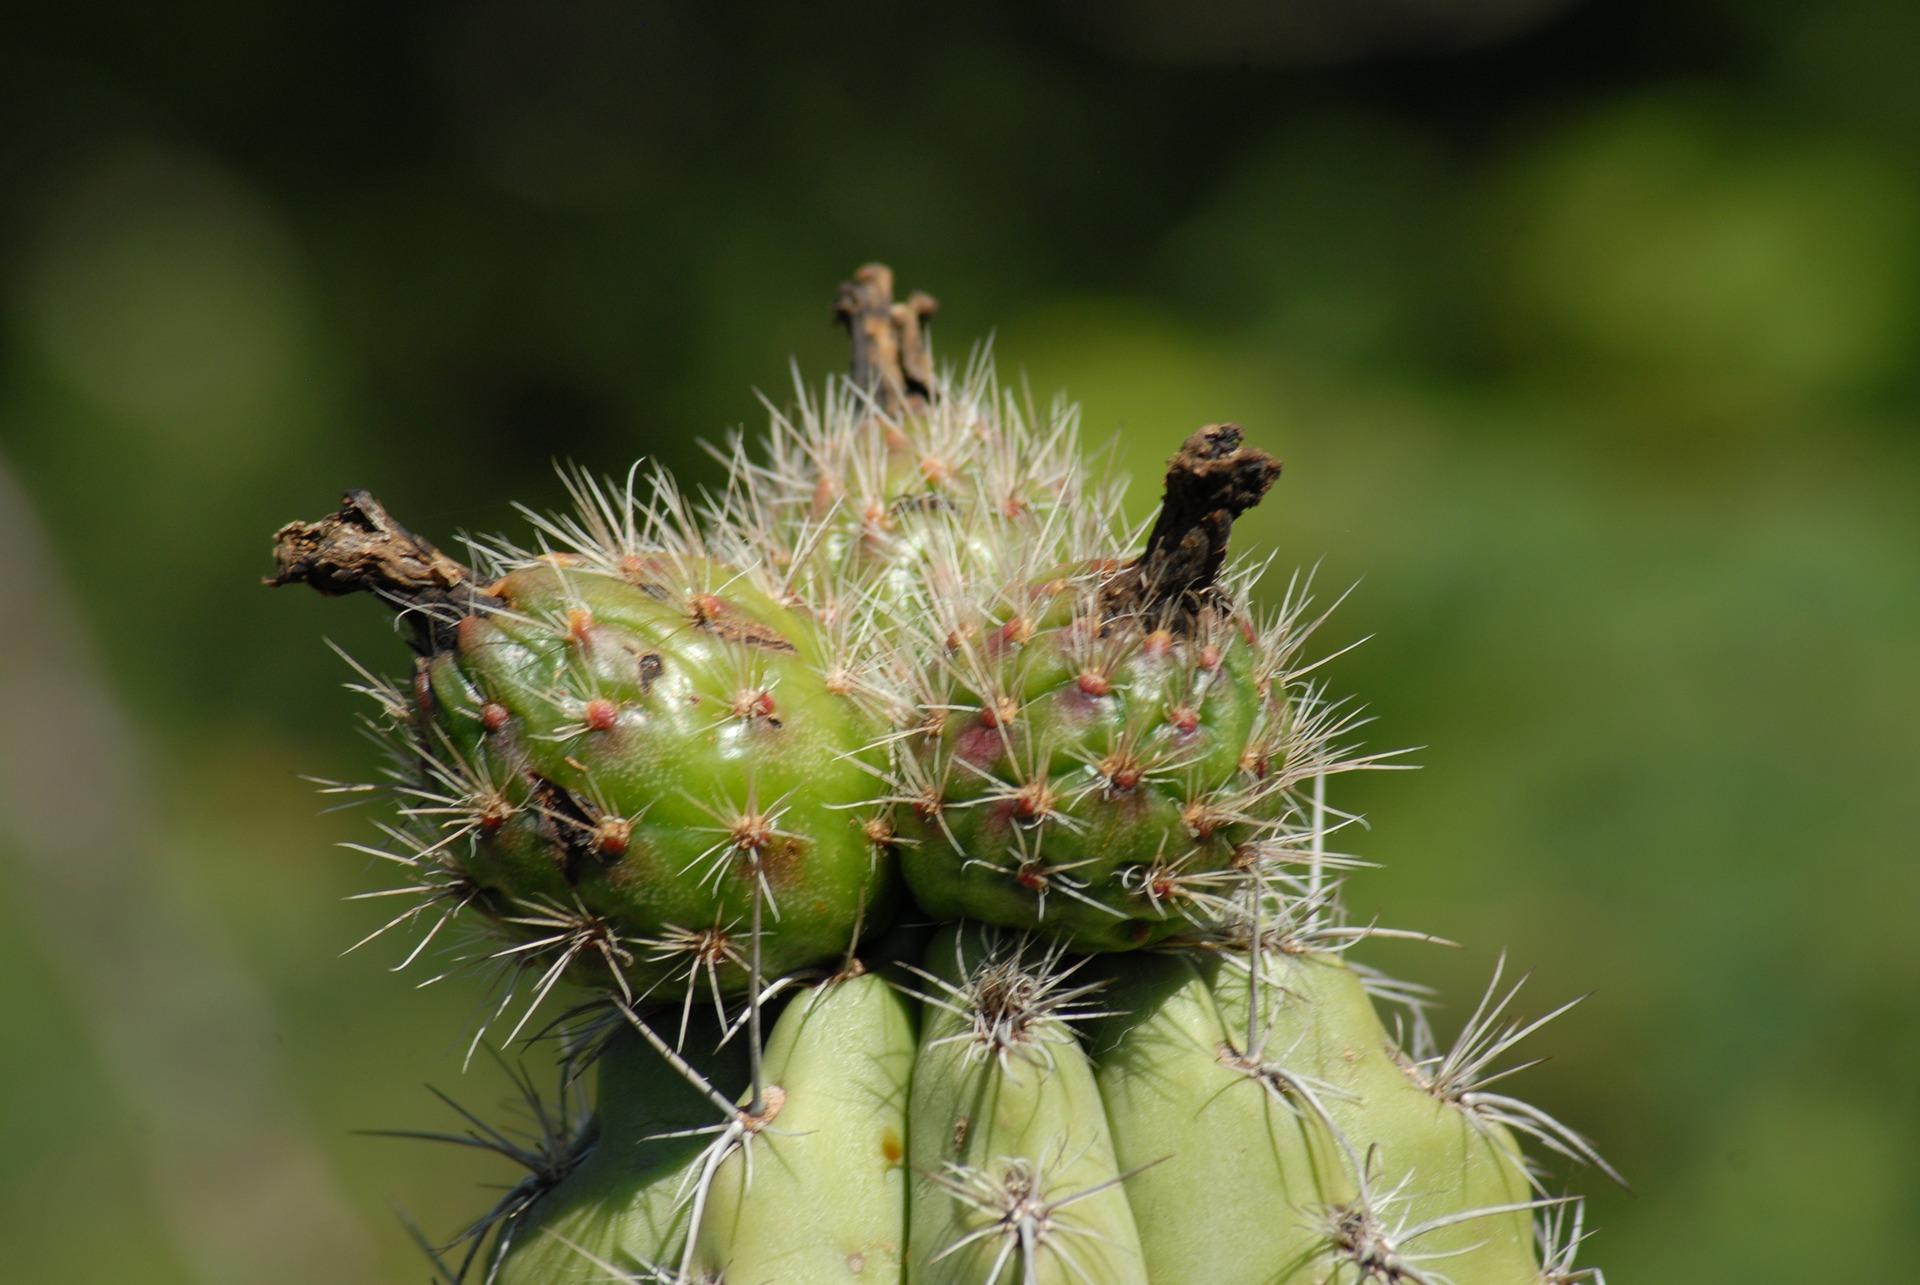 Pitaya y pitahaya